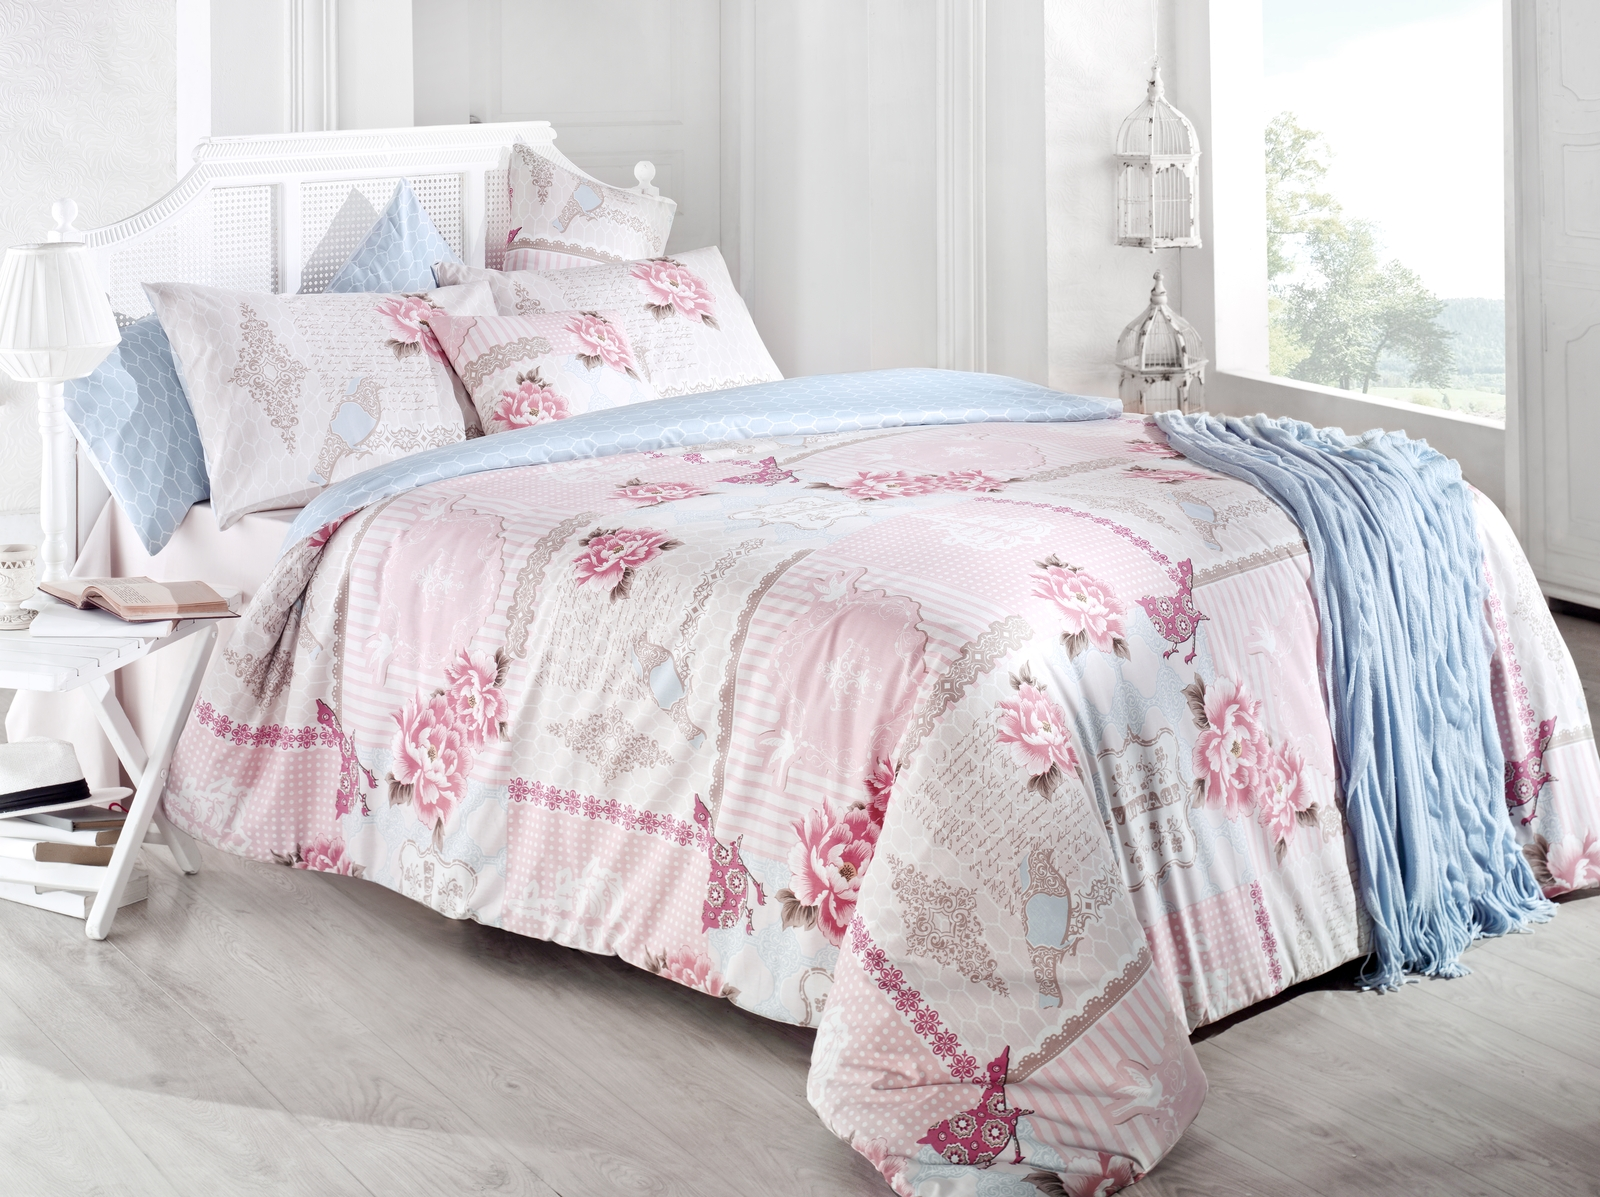 Комплект белья Issimo Home Pastoral, евро, наволочки 50x70, цвет: розовый